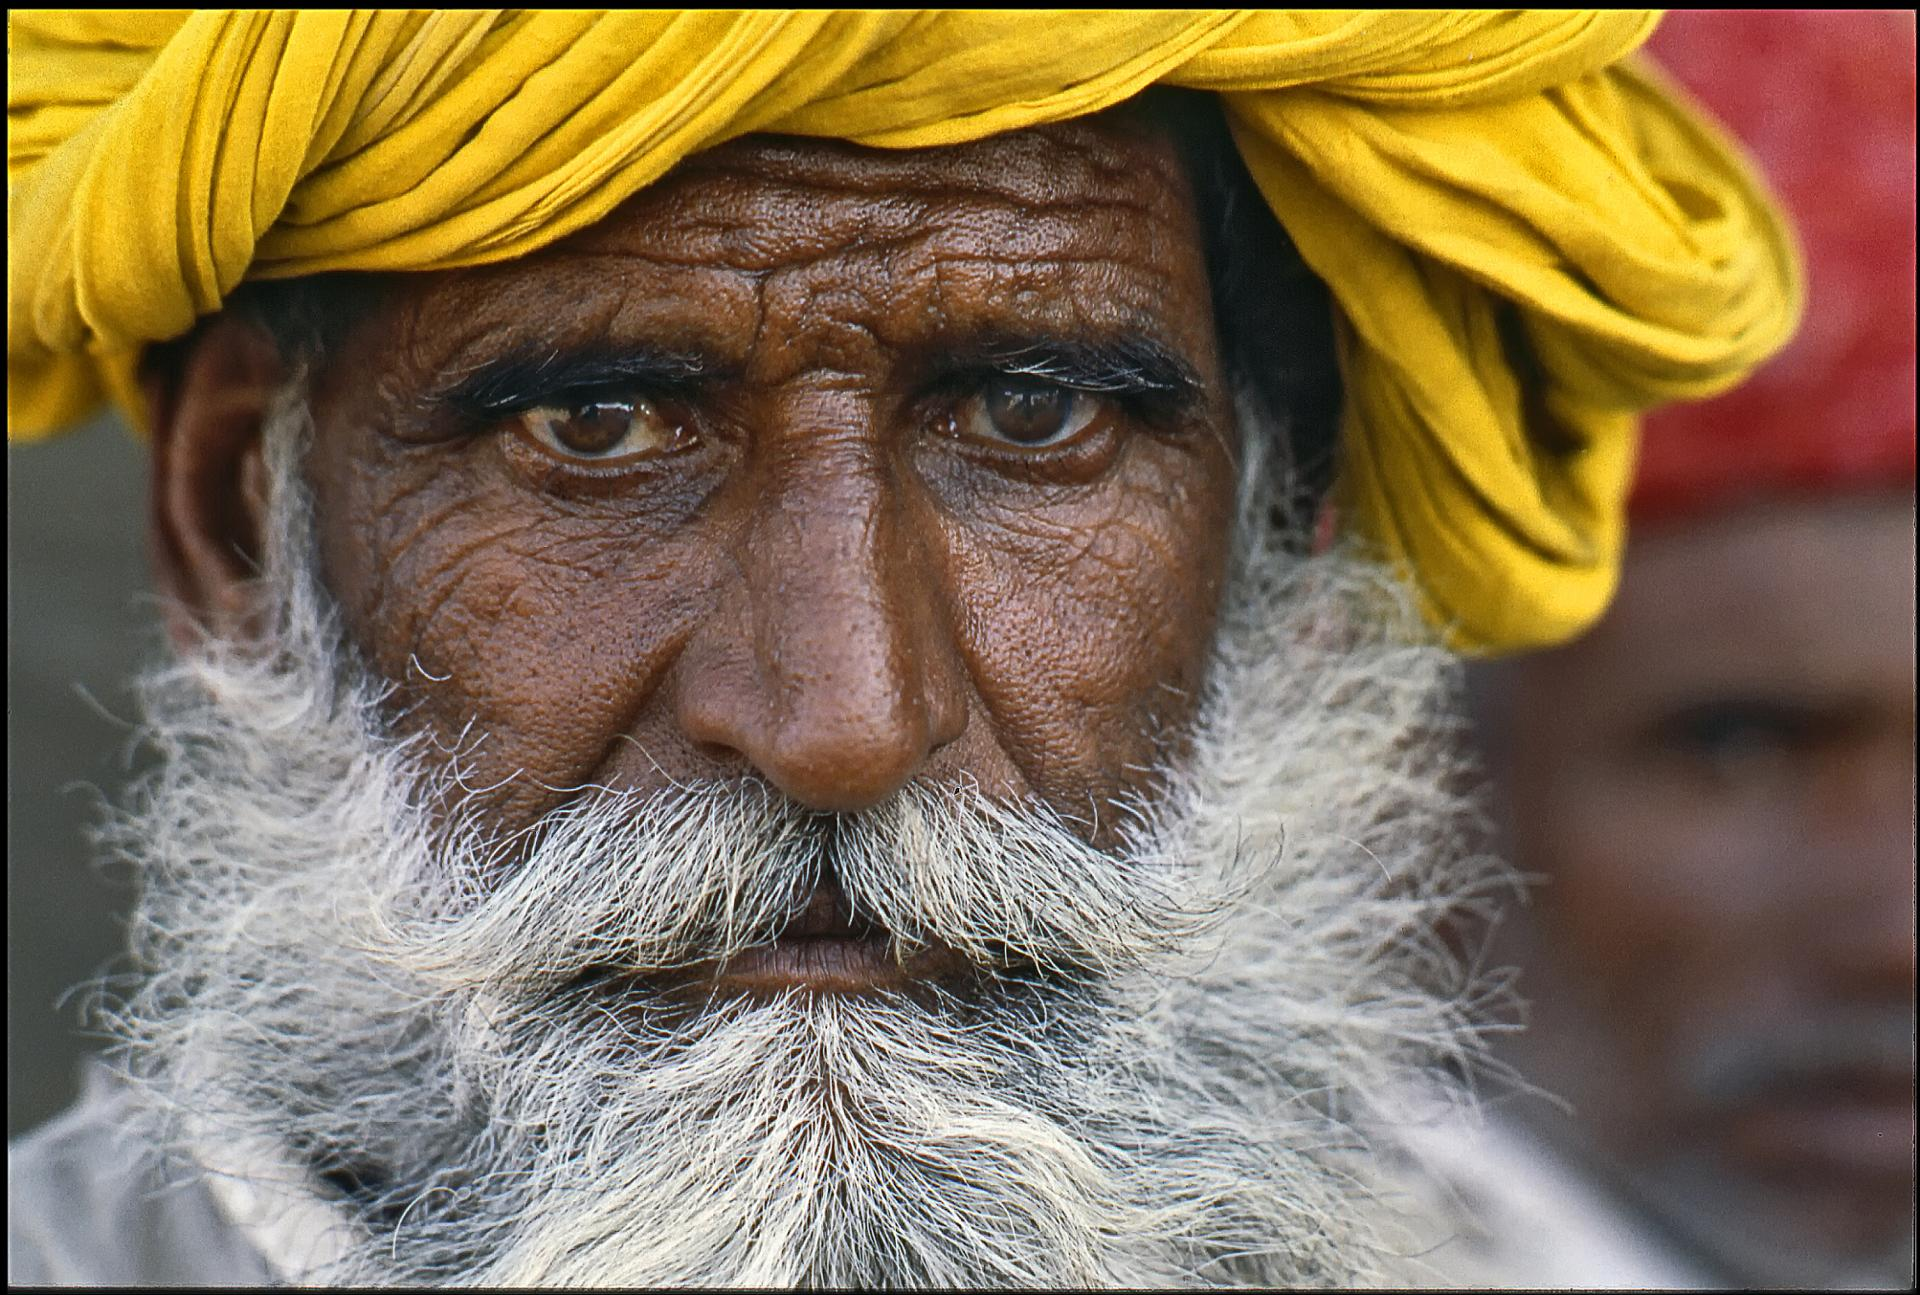 Le turban jaune